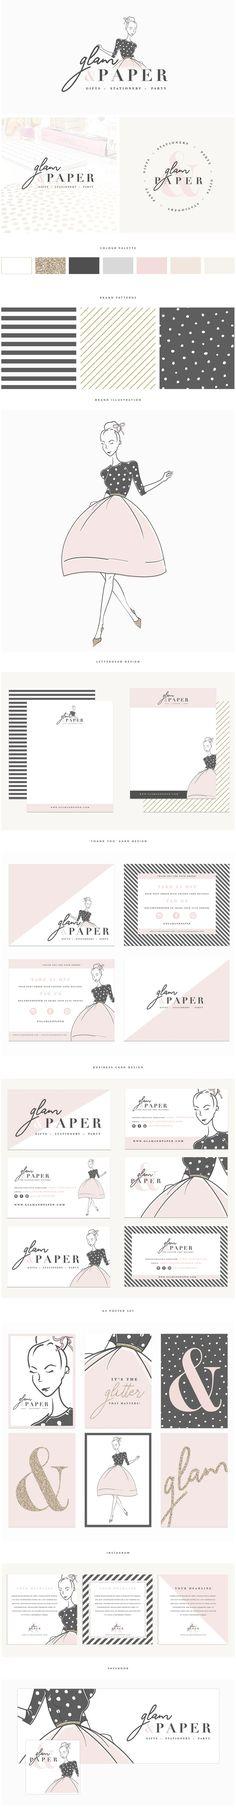 Brand Design | Glam & Paper » Brand Me Beautiful More